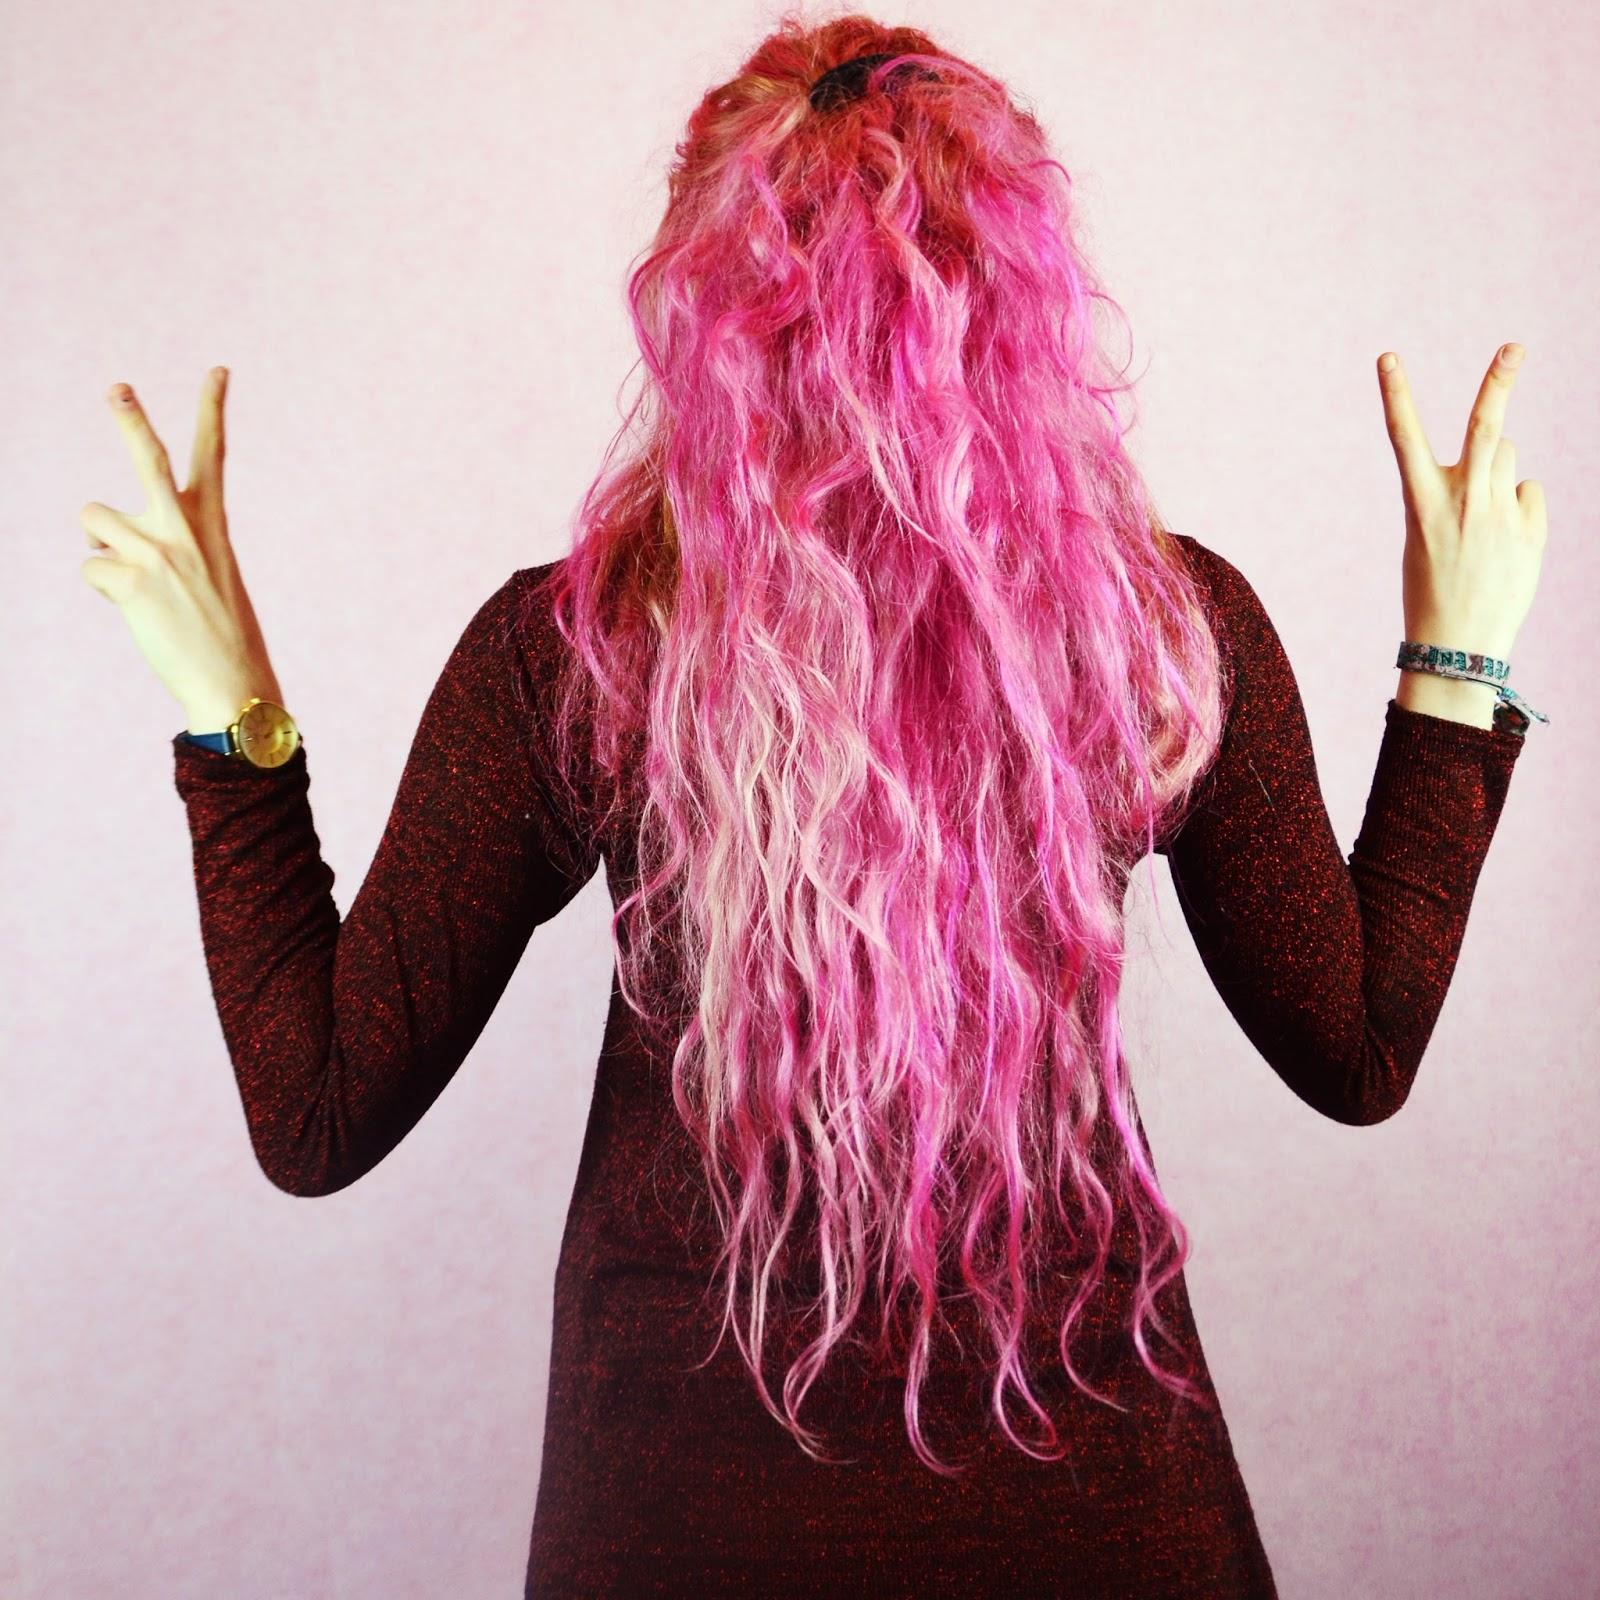 Stephi LaReine dyed pink hair